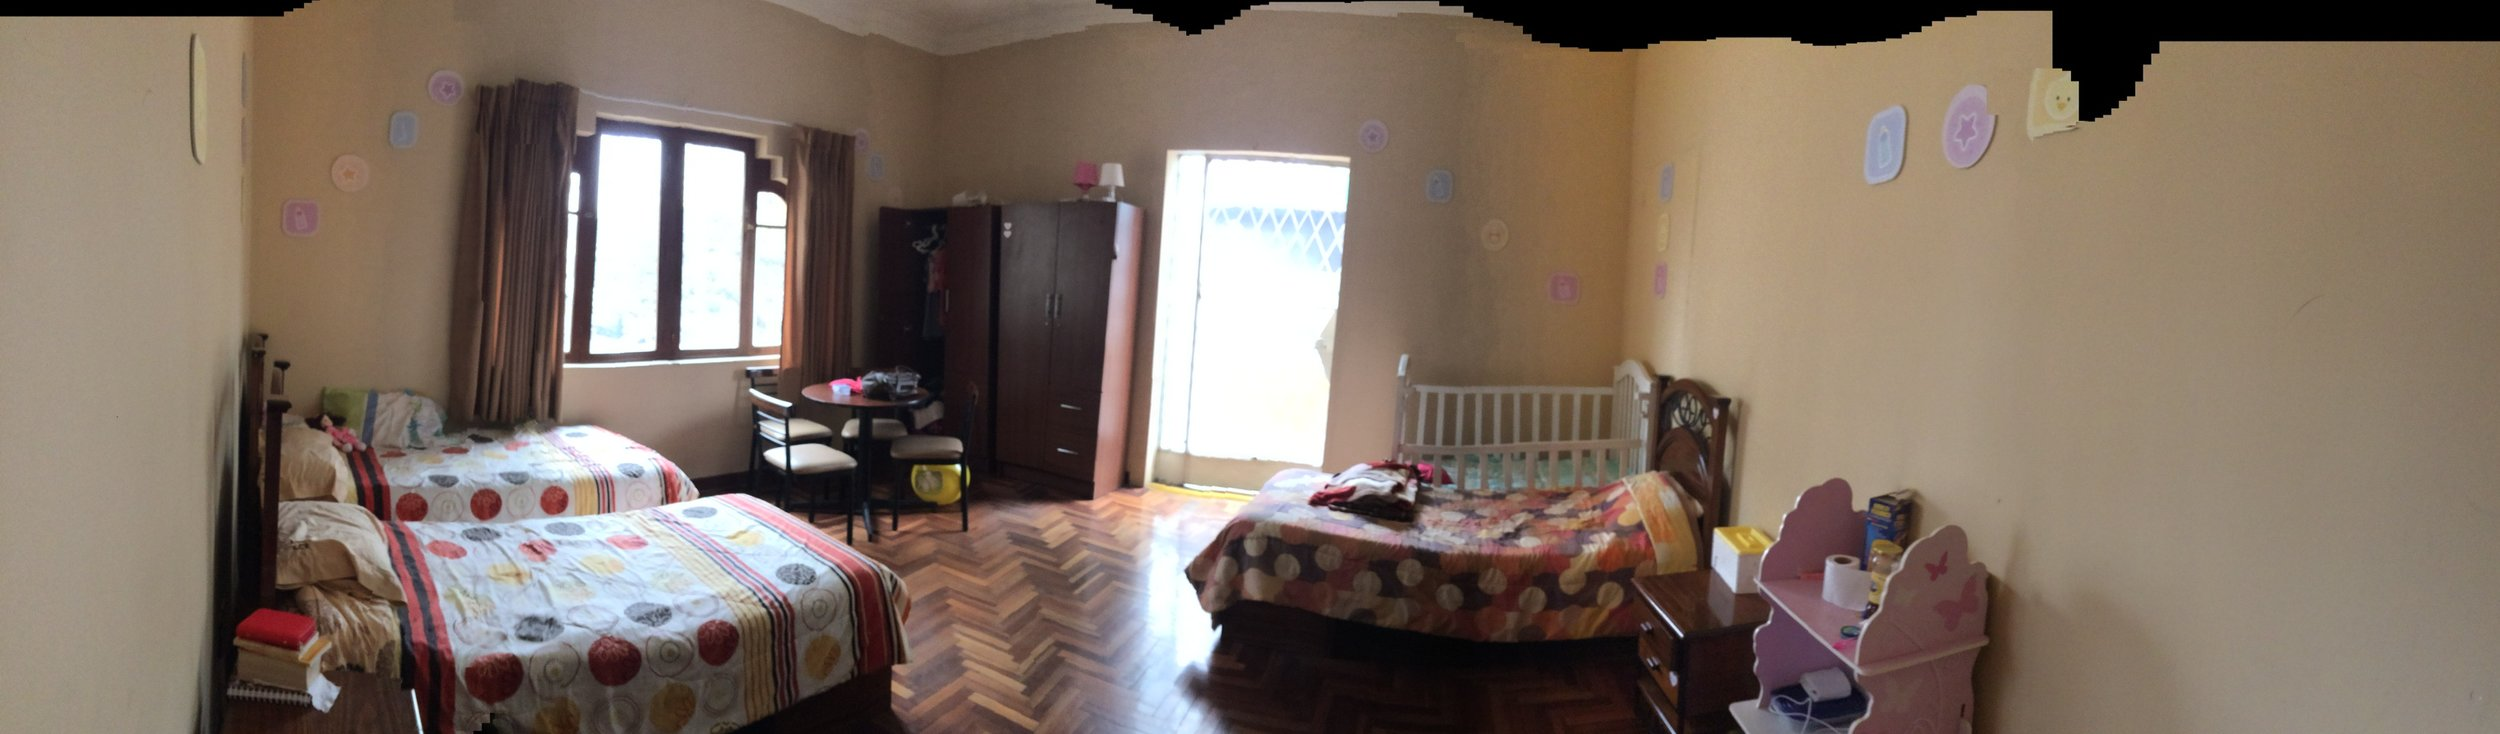 RMH Peru Guest Room.jpg